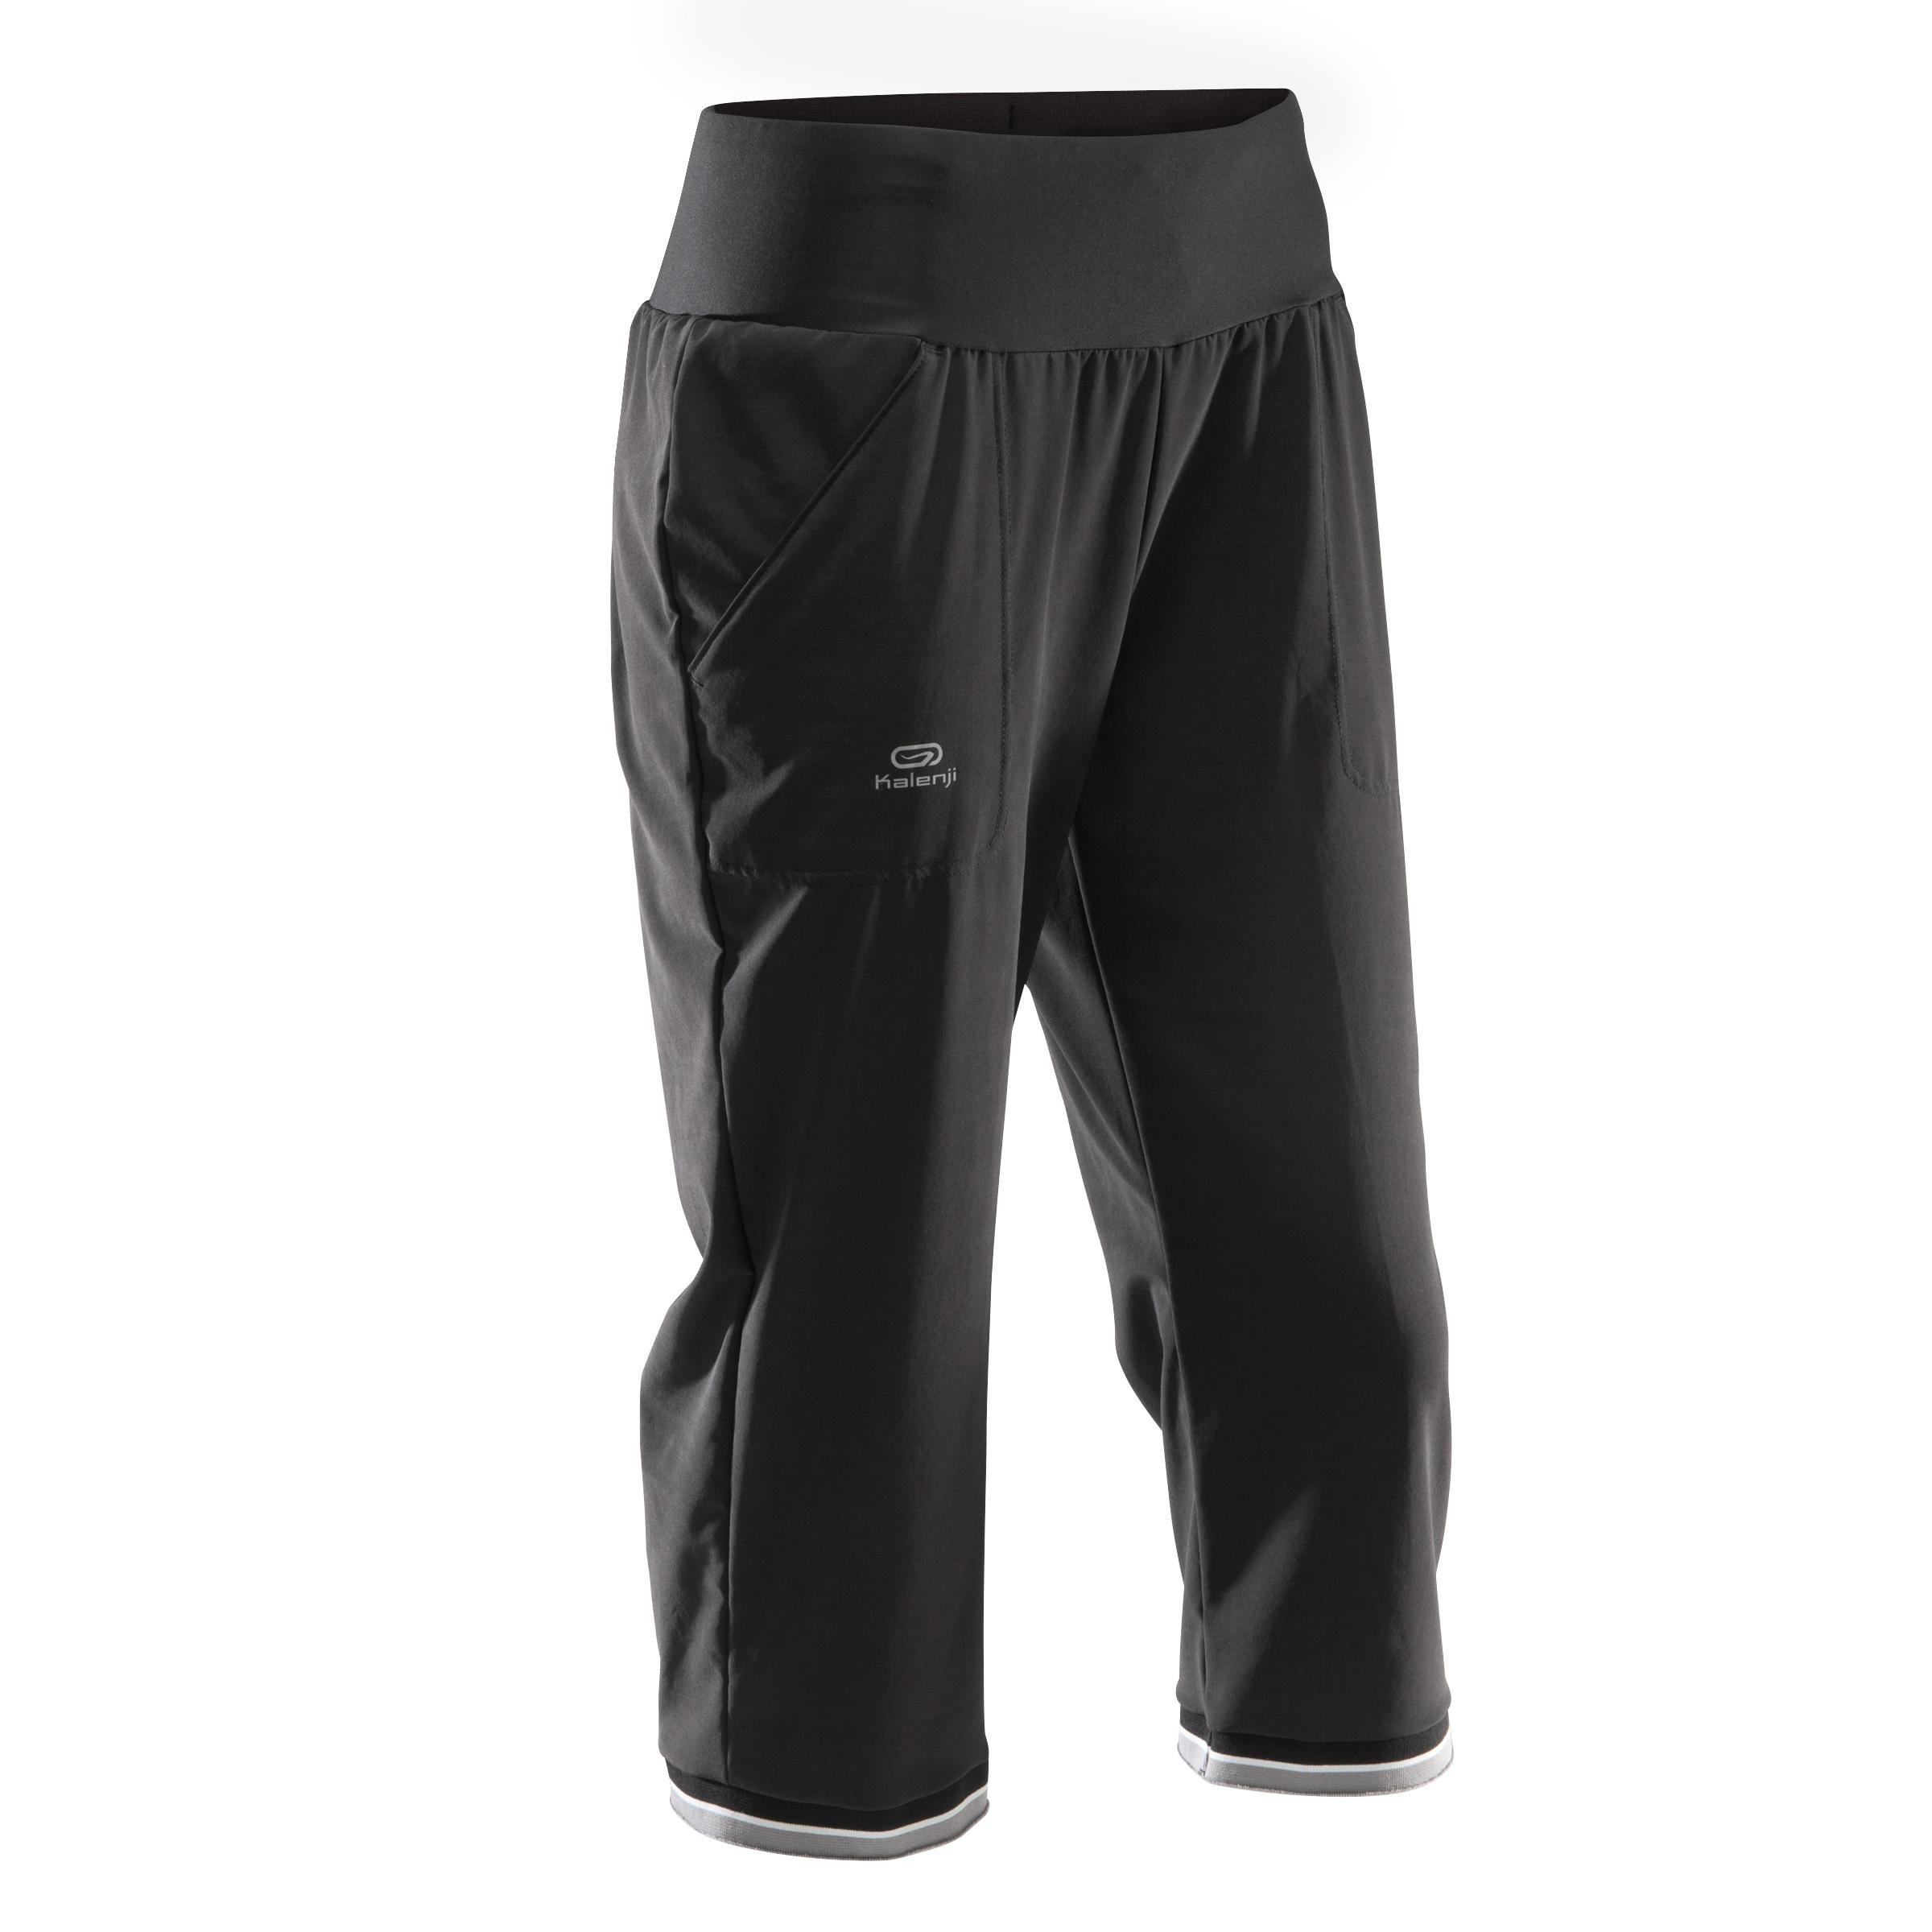 Laufhose 3/4 Run Dry Damen schwarz | Sportbekleidung > Sporthosen > Laufhosen | Schwarz | Kalenji